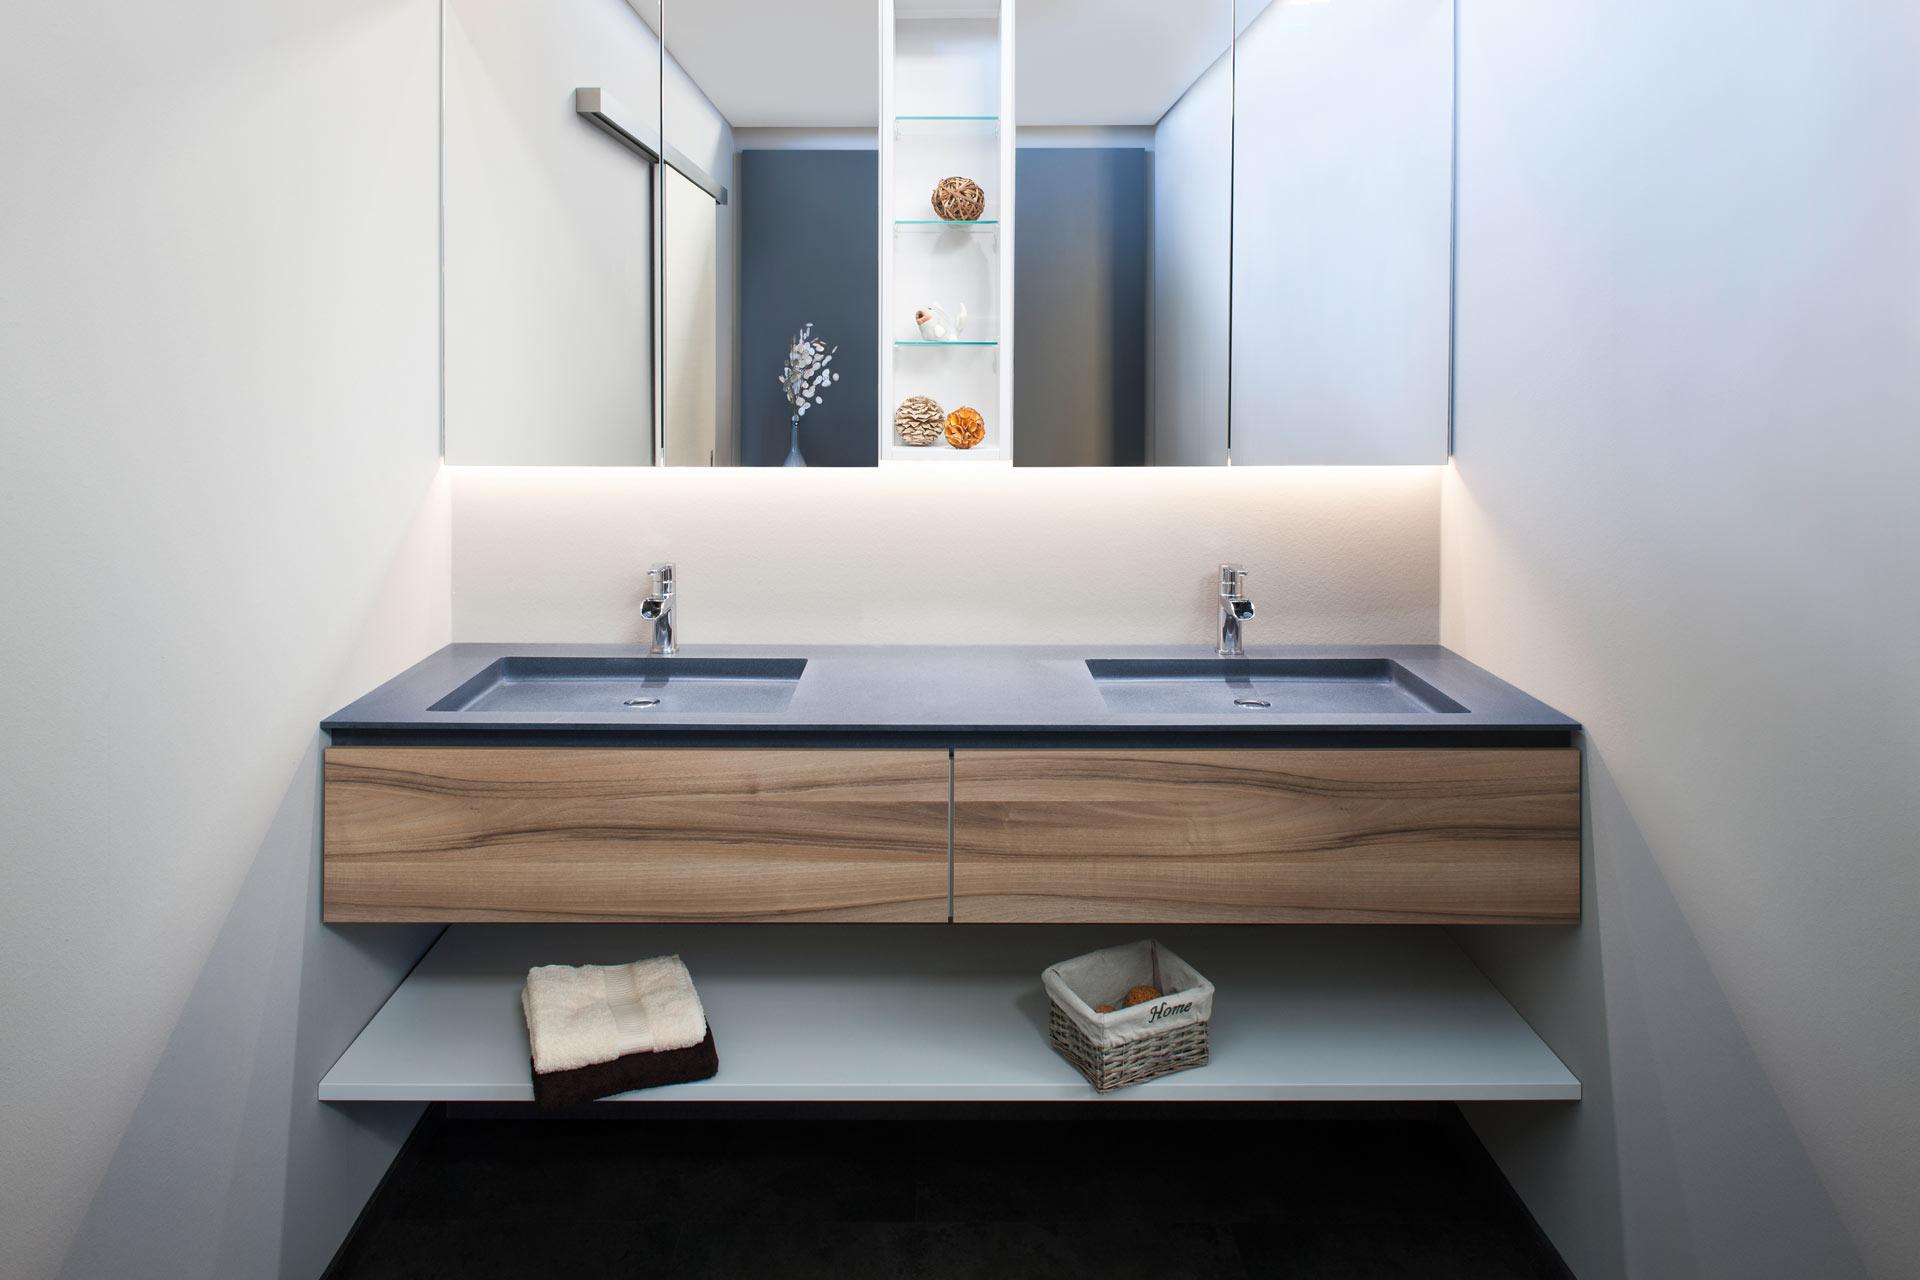 Keller-Innenausbau-Bad-Design-Badwelt